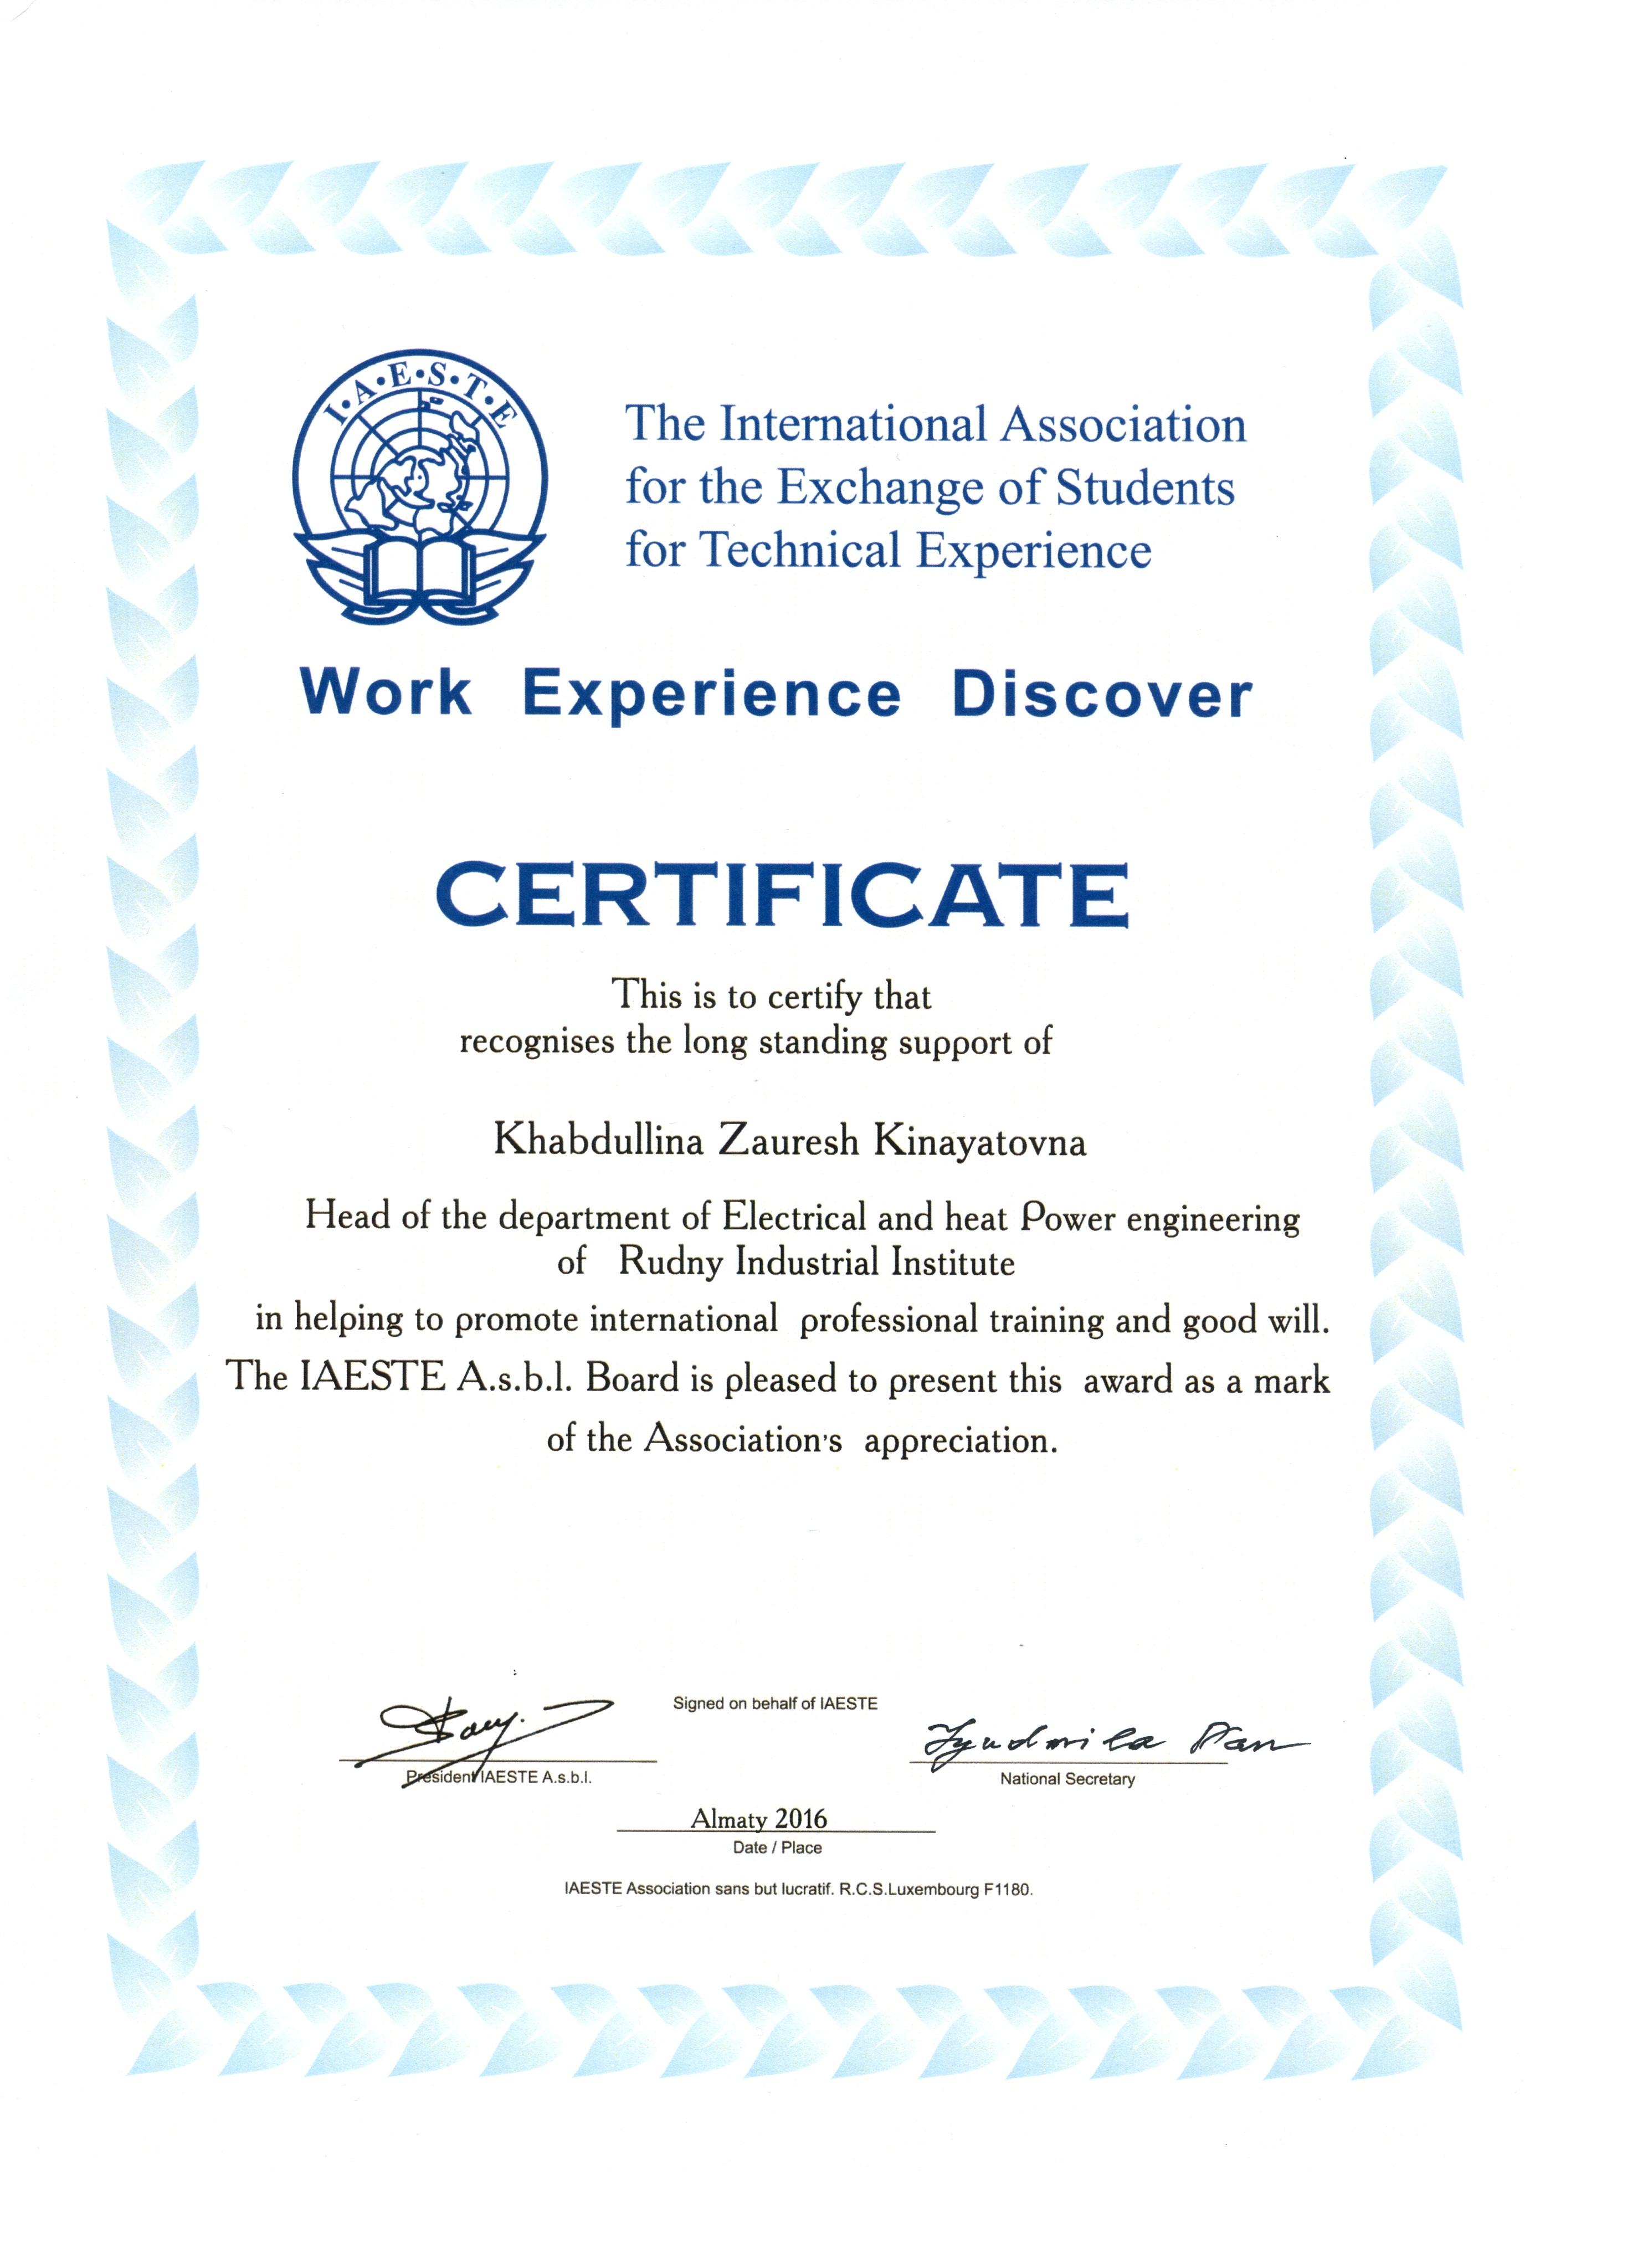 iaeste-certificate-fo-khabdullina